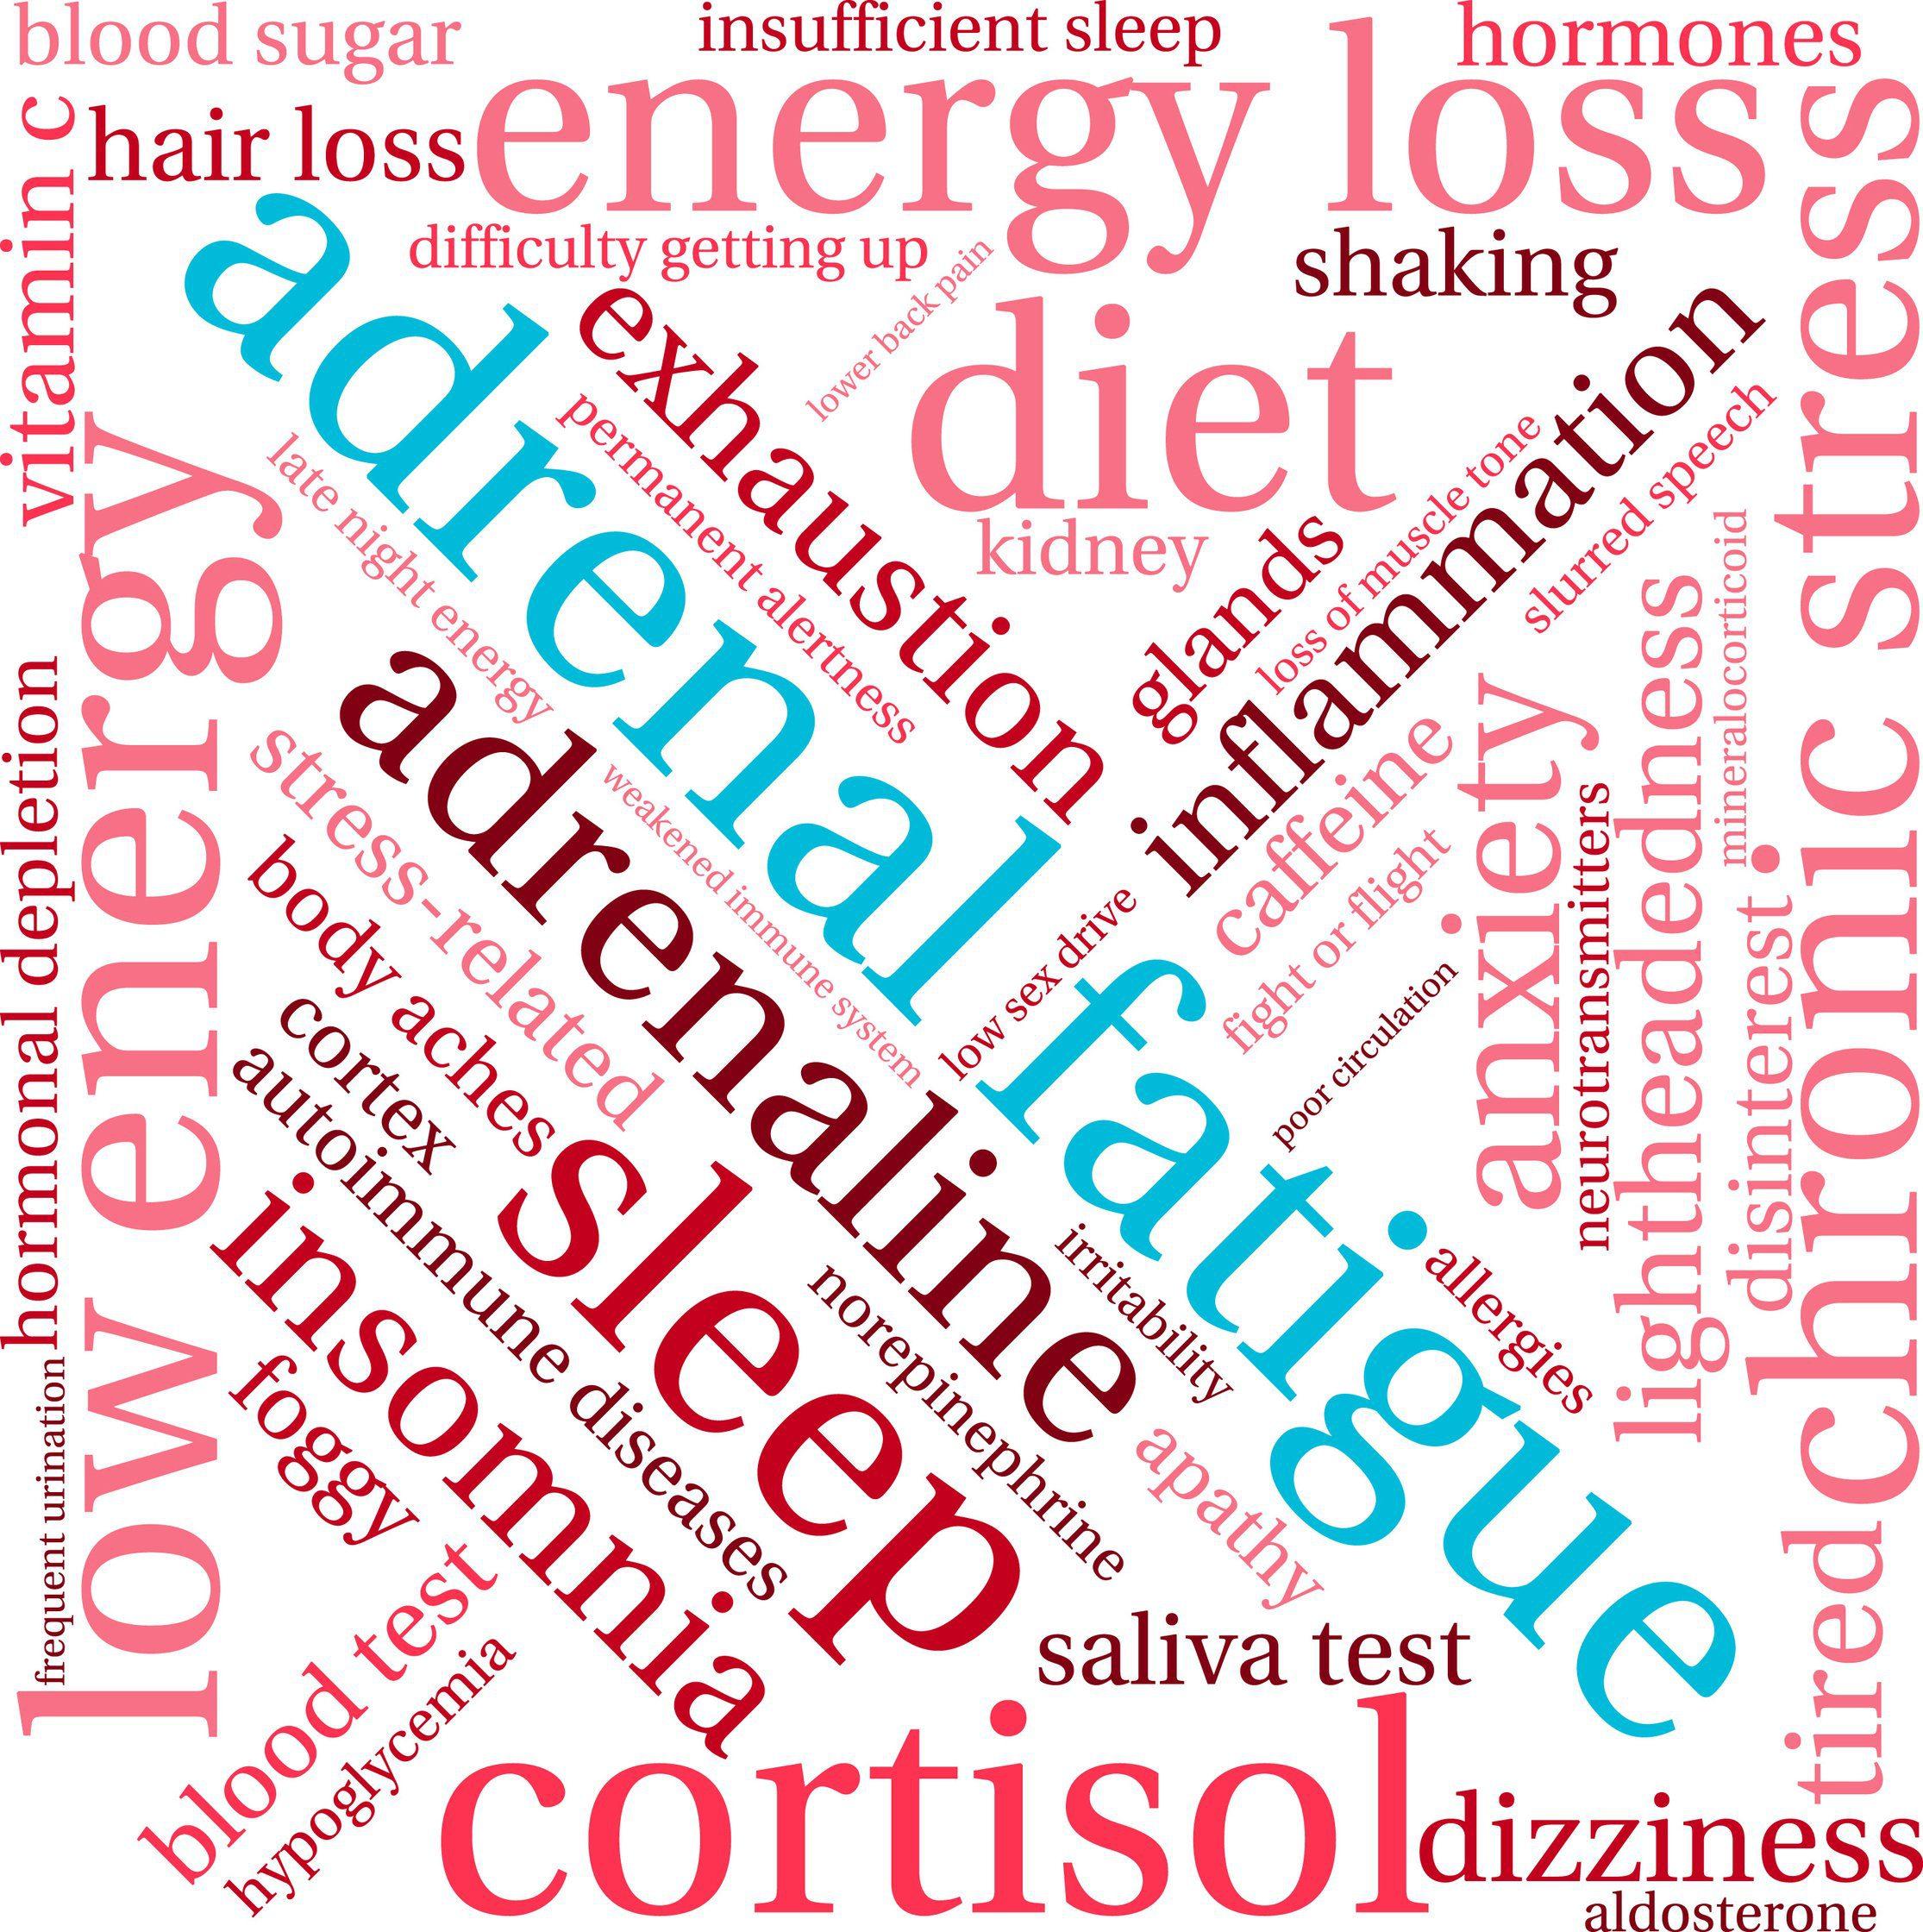 word cloud focused on adrenal fatigue